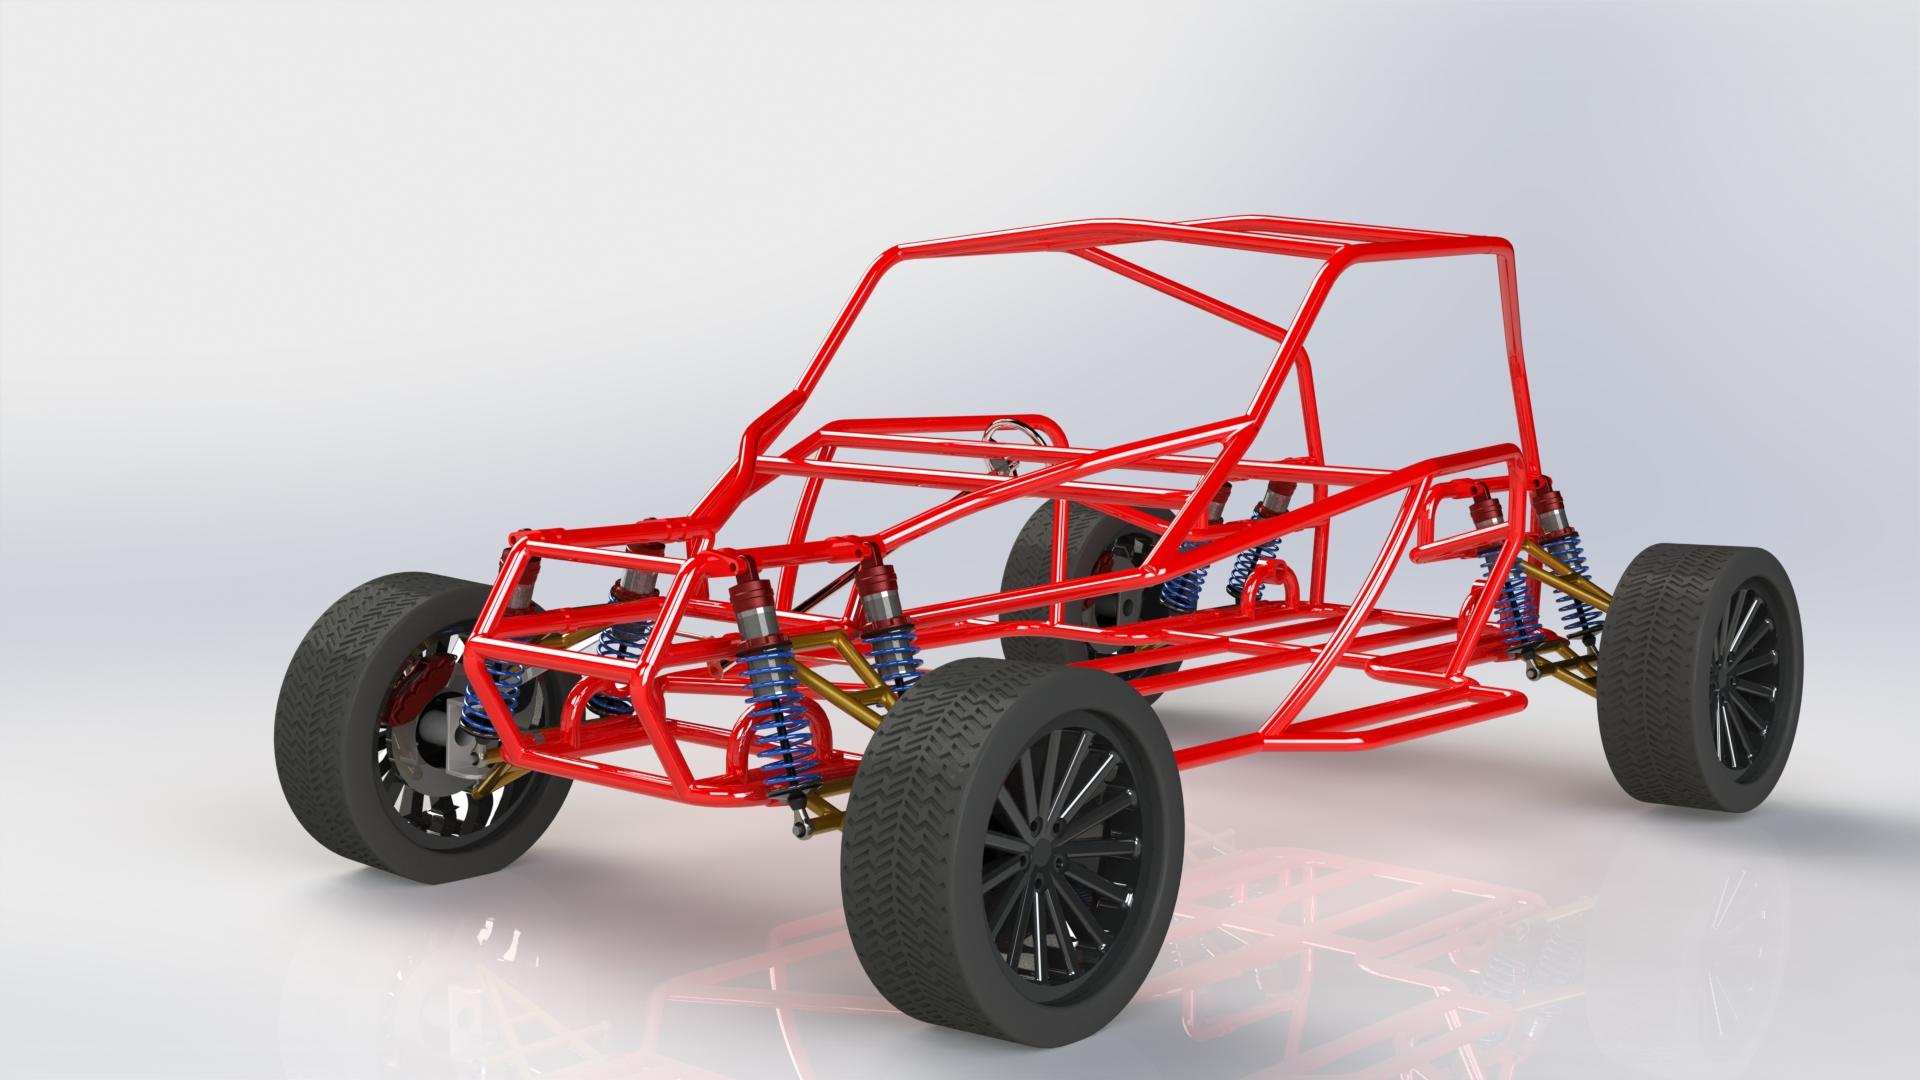 Buggy design